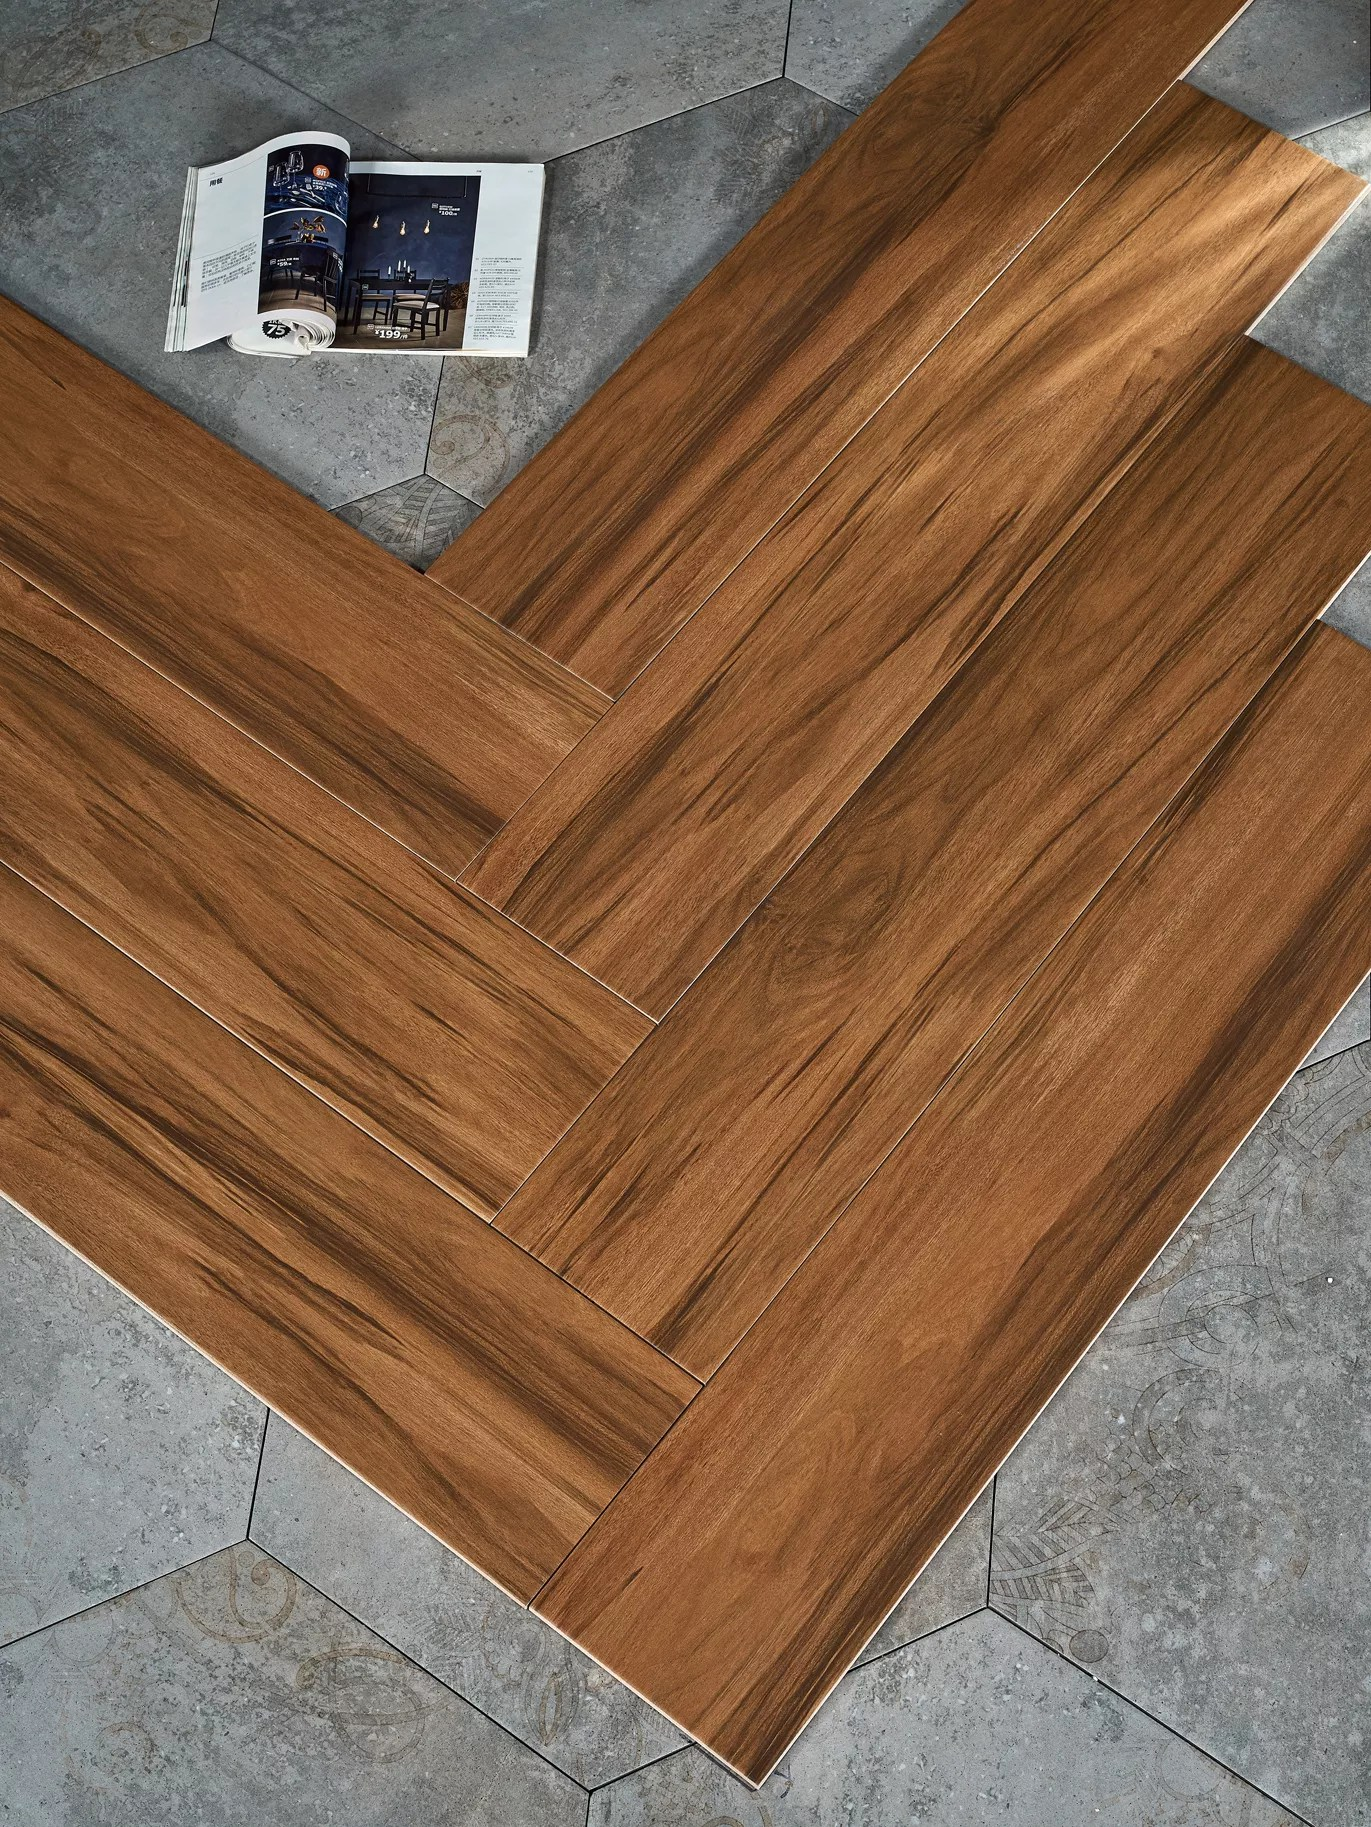 engineered flooring wood look tile wood ceramic tile menards floor tile buy wood look tile wood ceramic tile menards floor tile product on